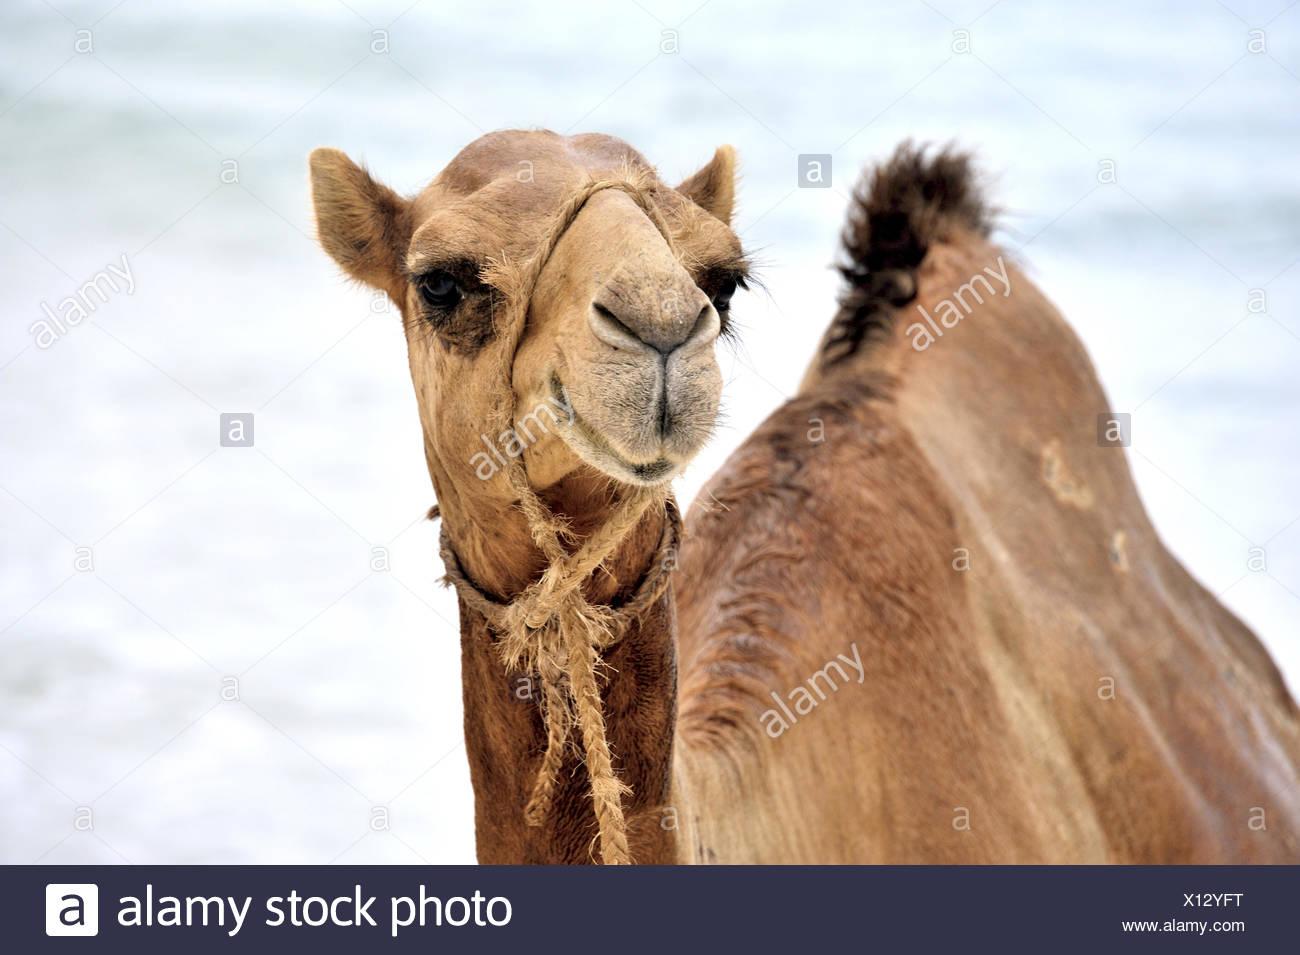 Observant Funny Camel - Stock Image